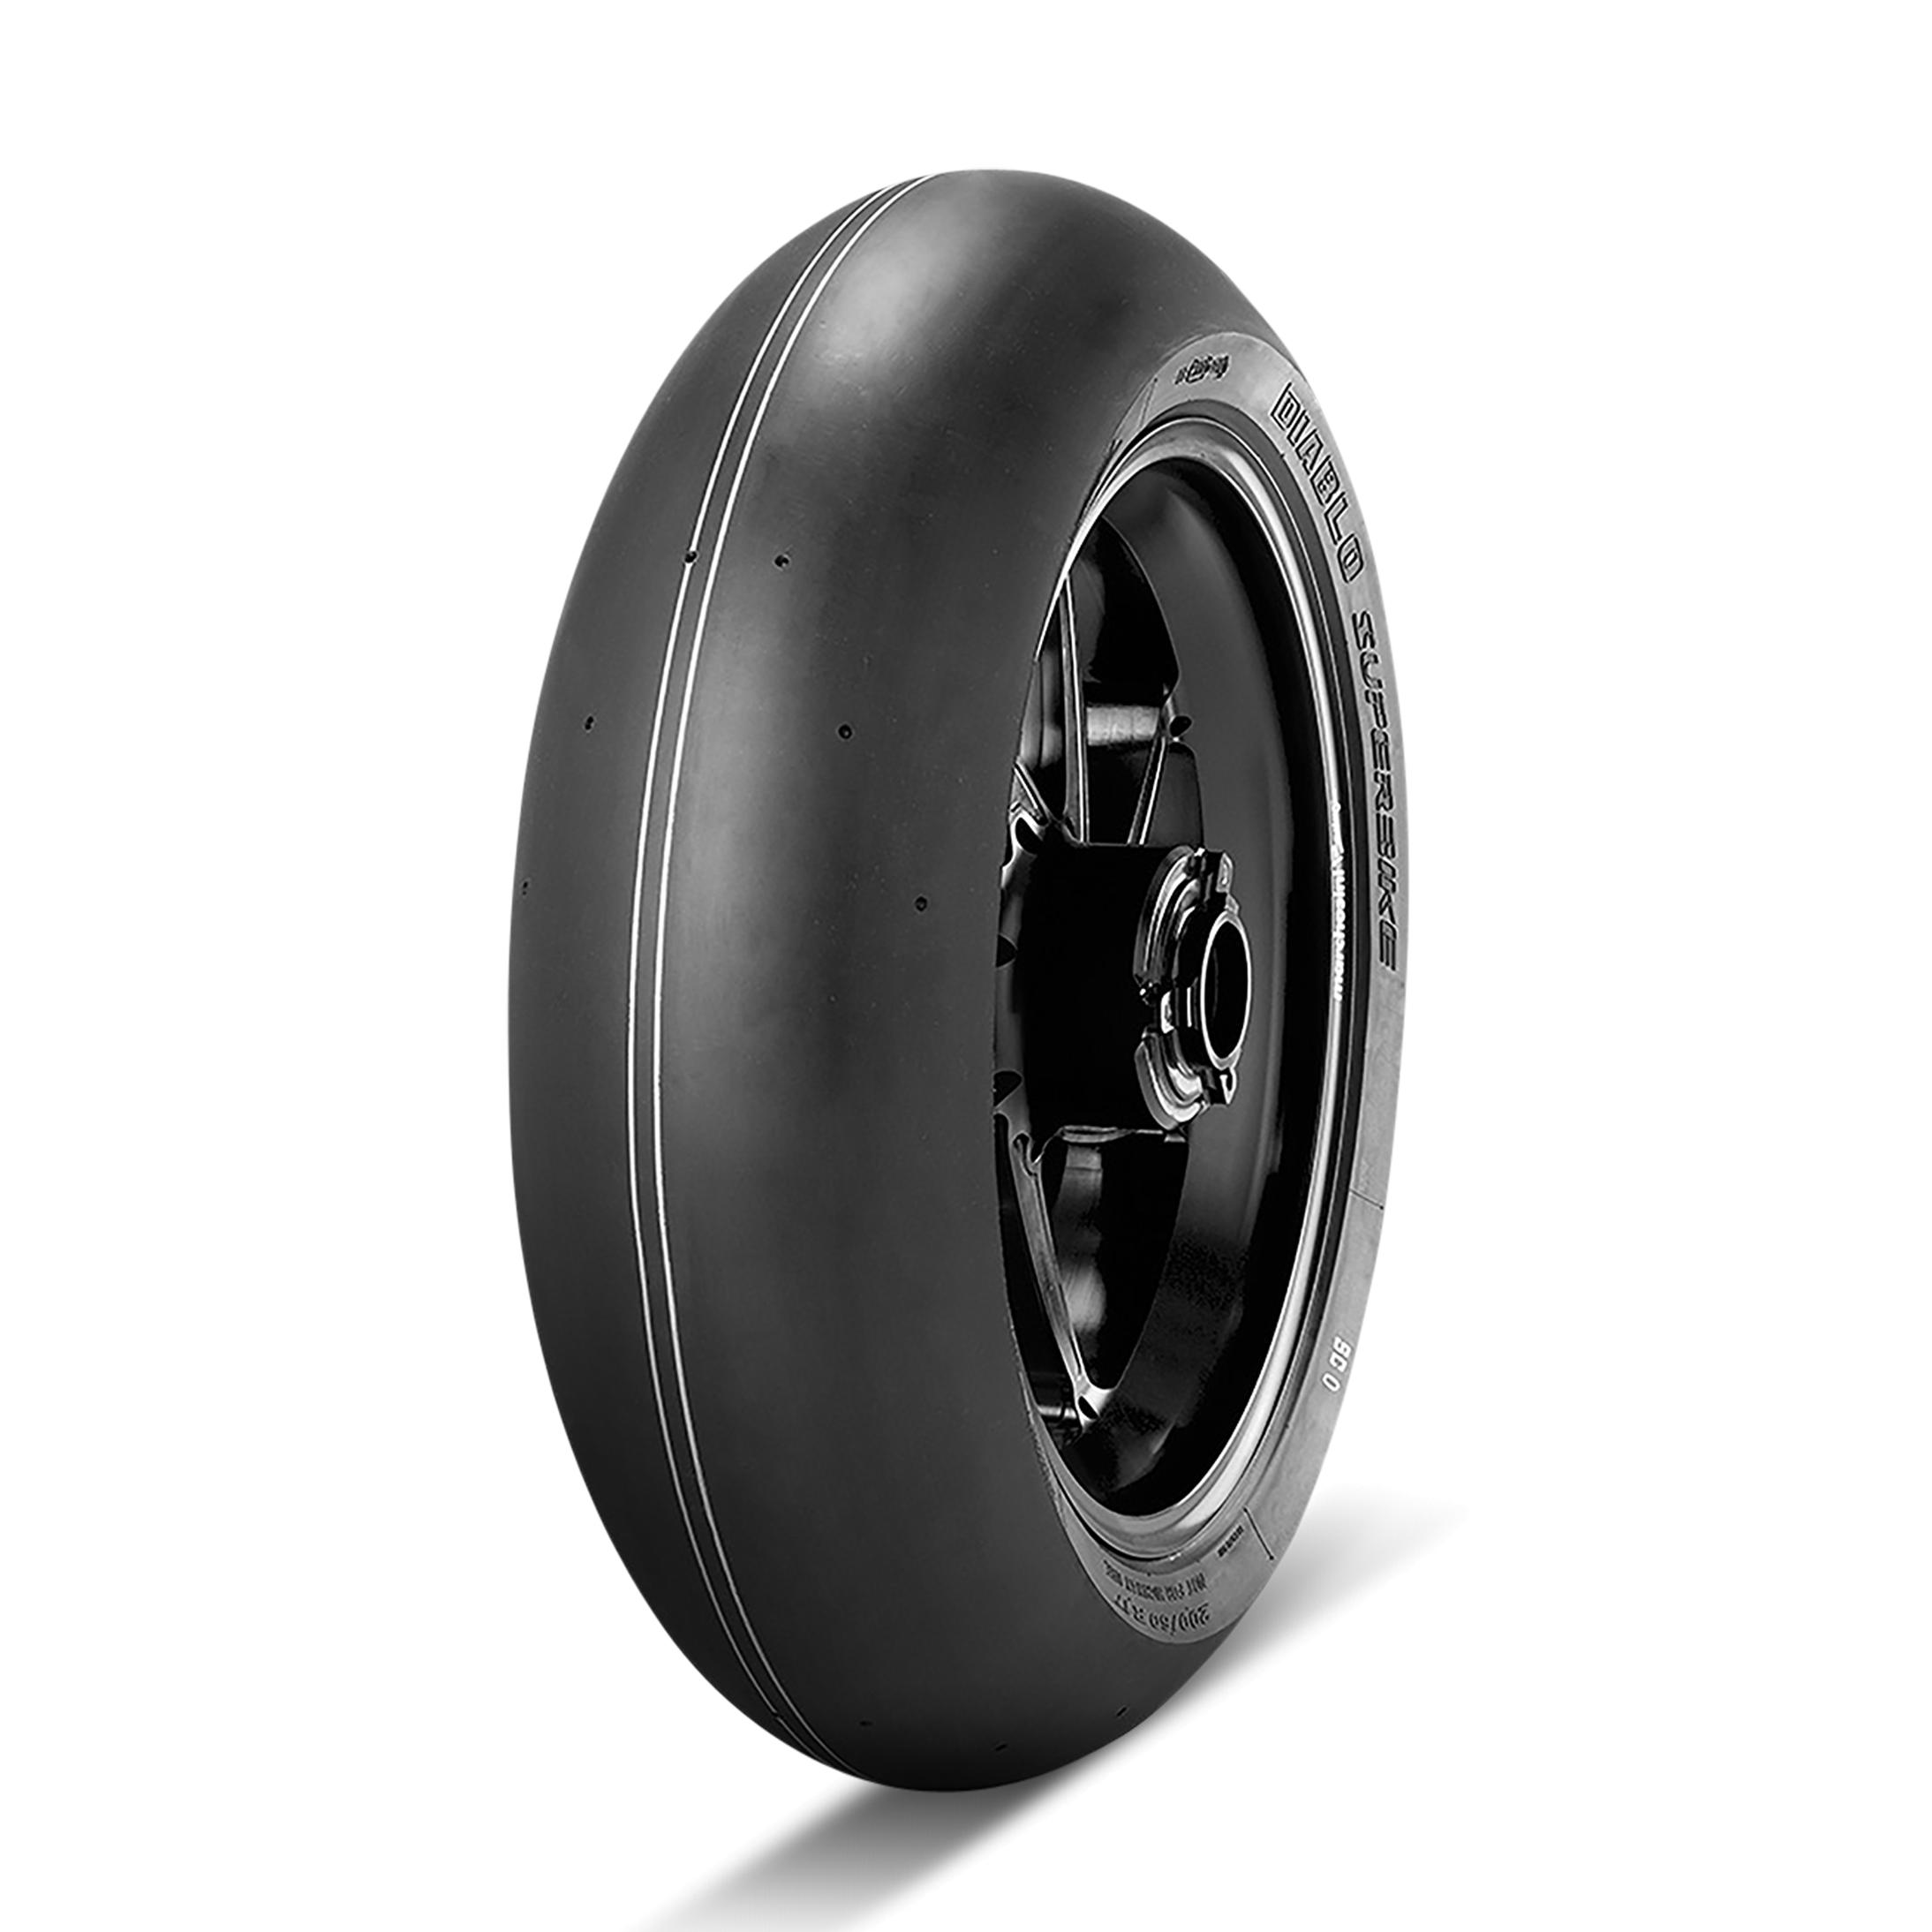 Pirelli Diablo Superbike 120/70 R 17 NHS TL